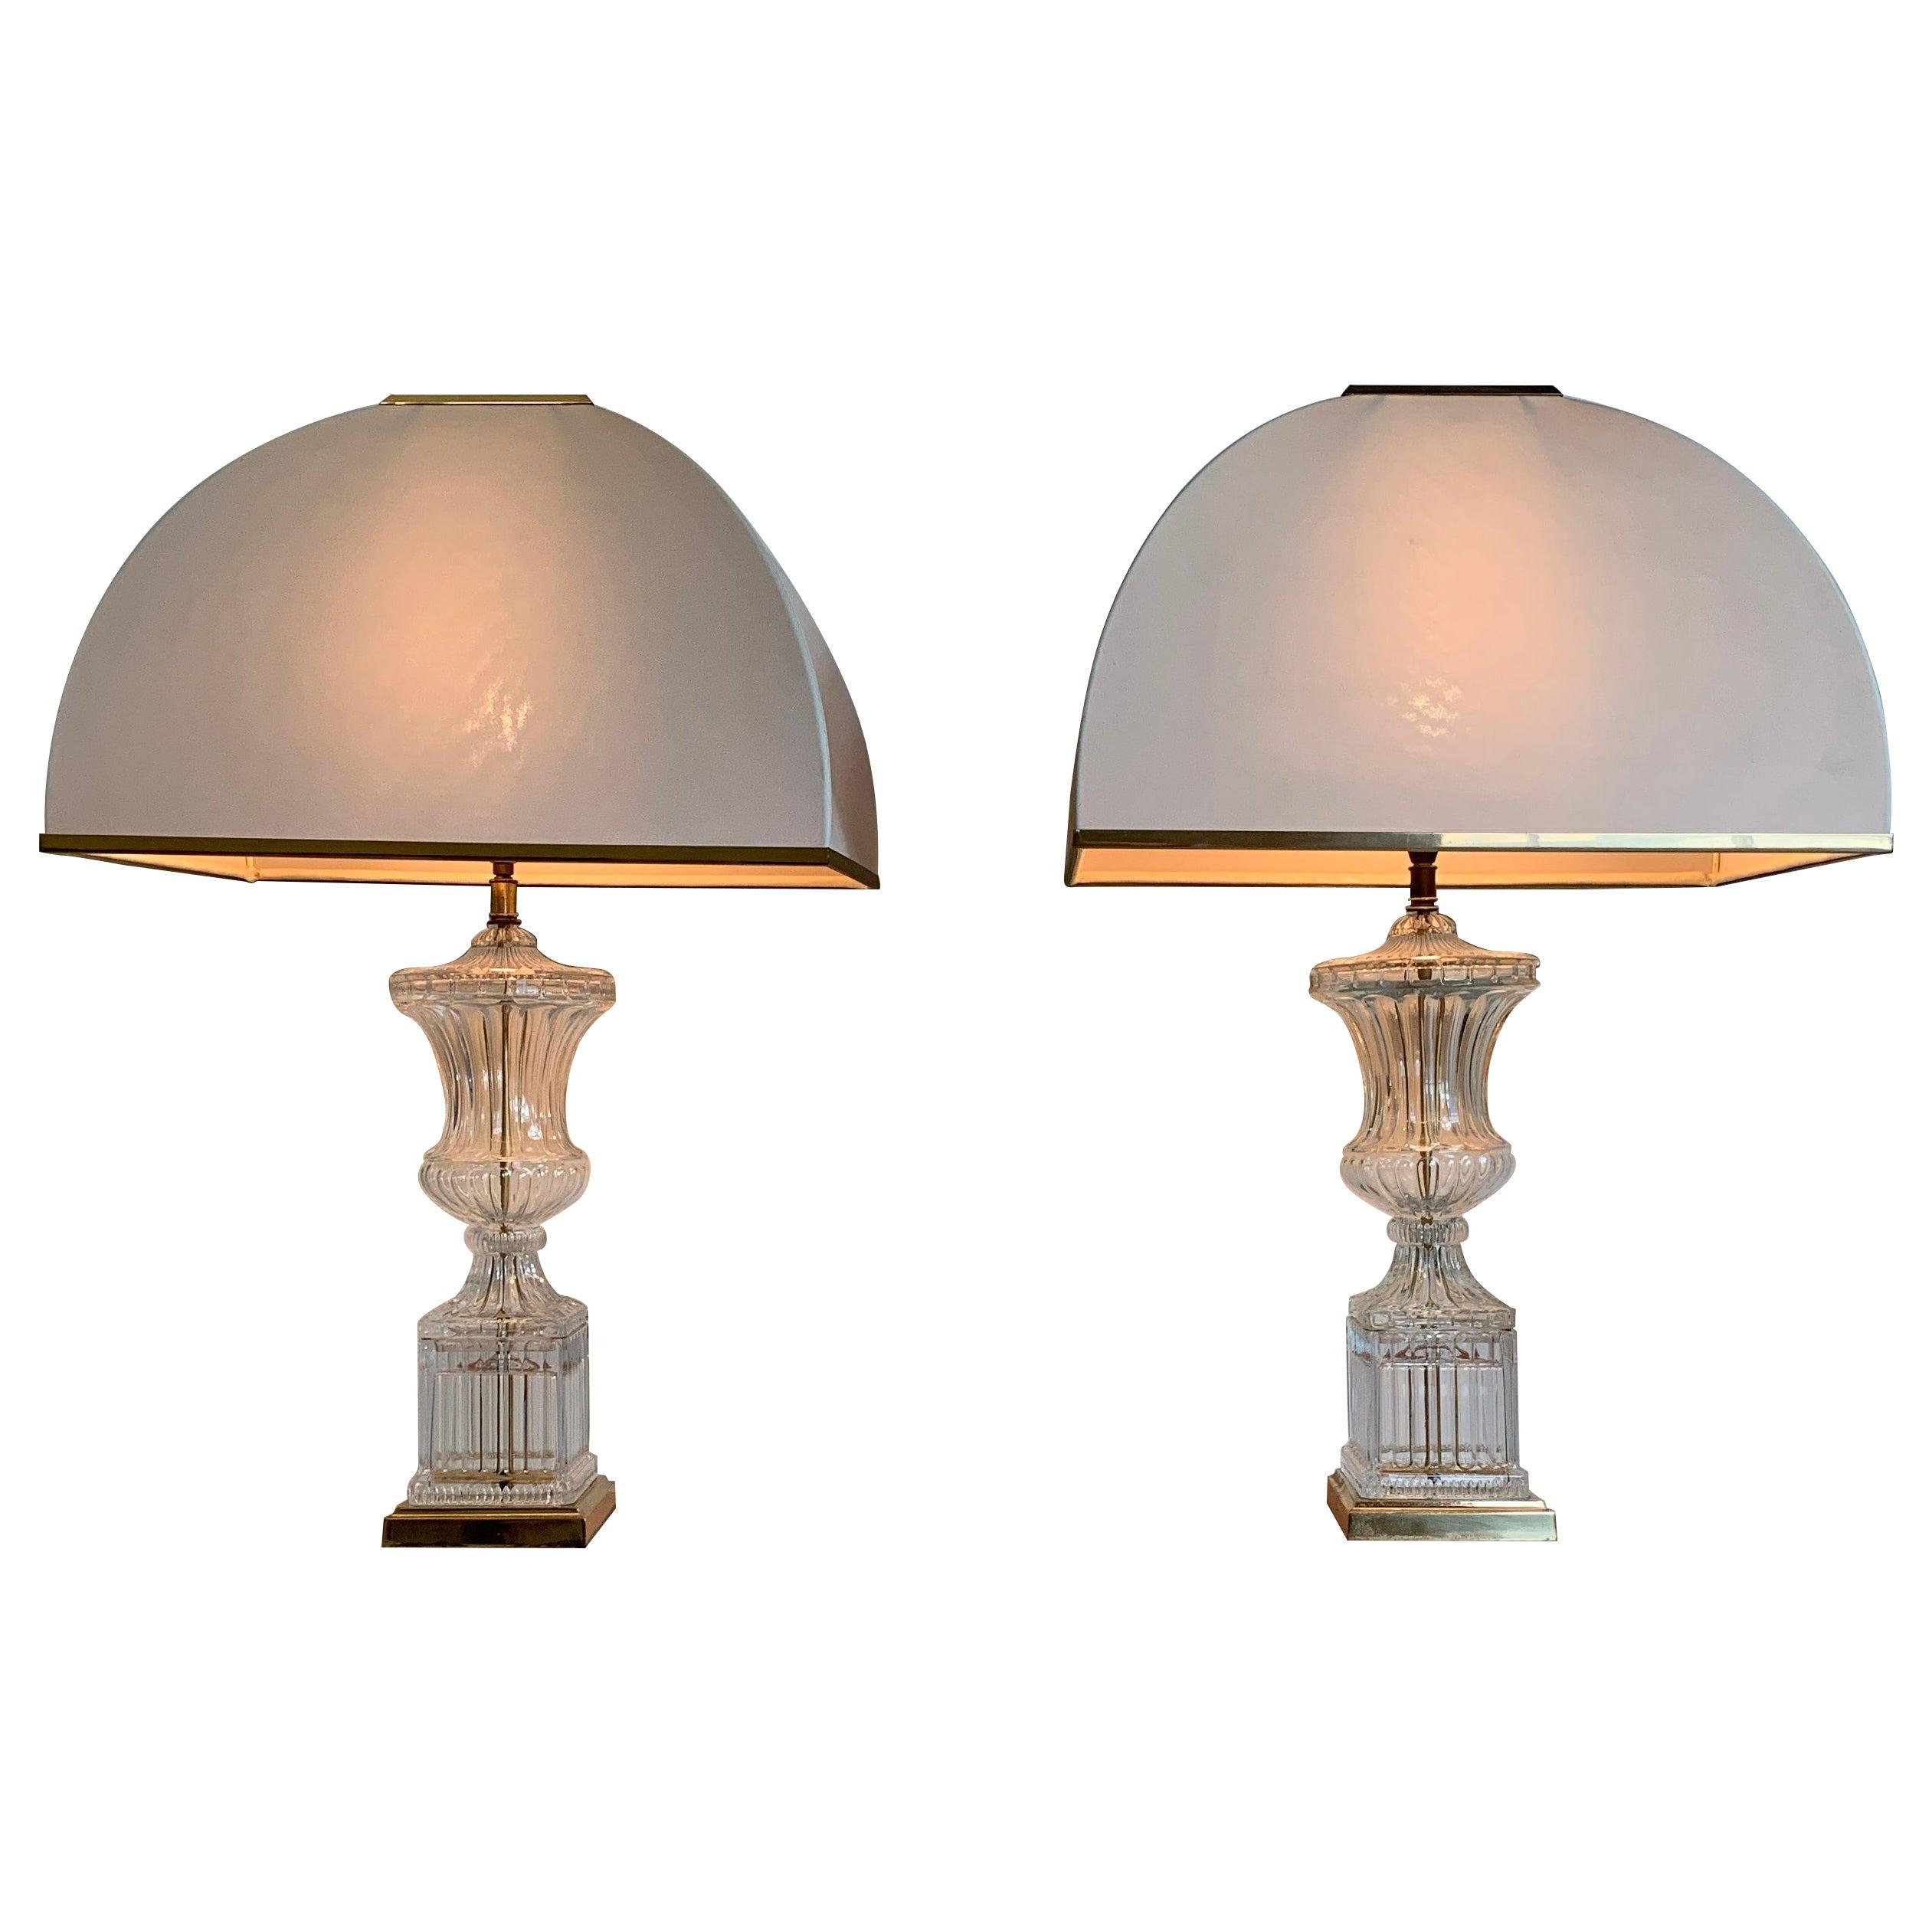 Pair of Midcentury Paul Hanson Attributed Glass Urn Lamps